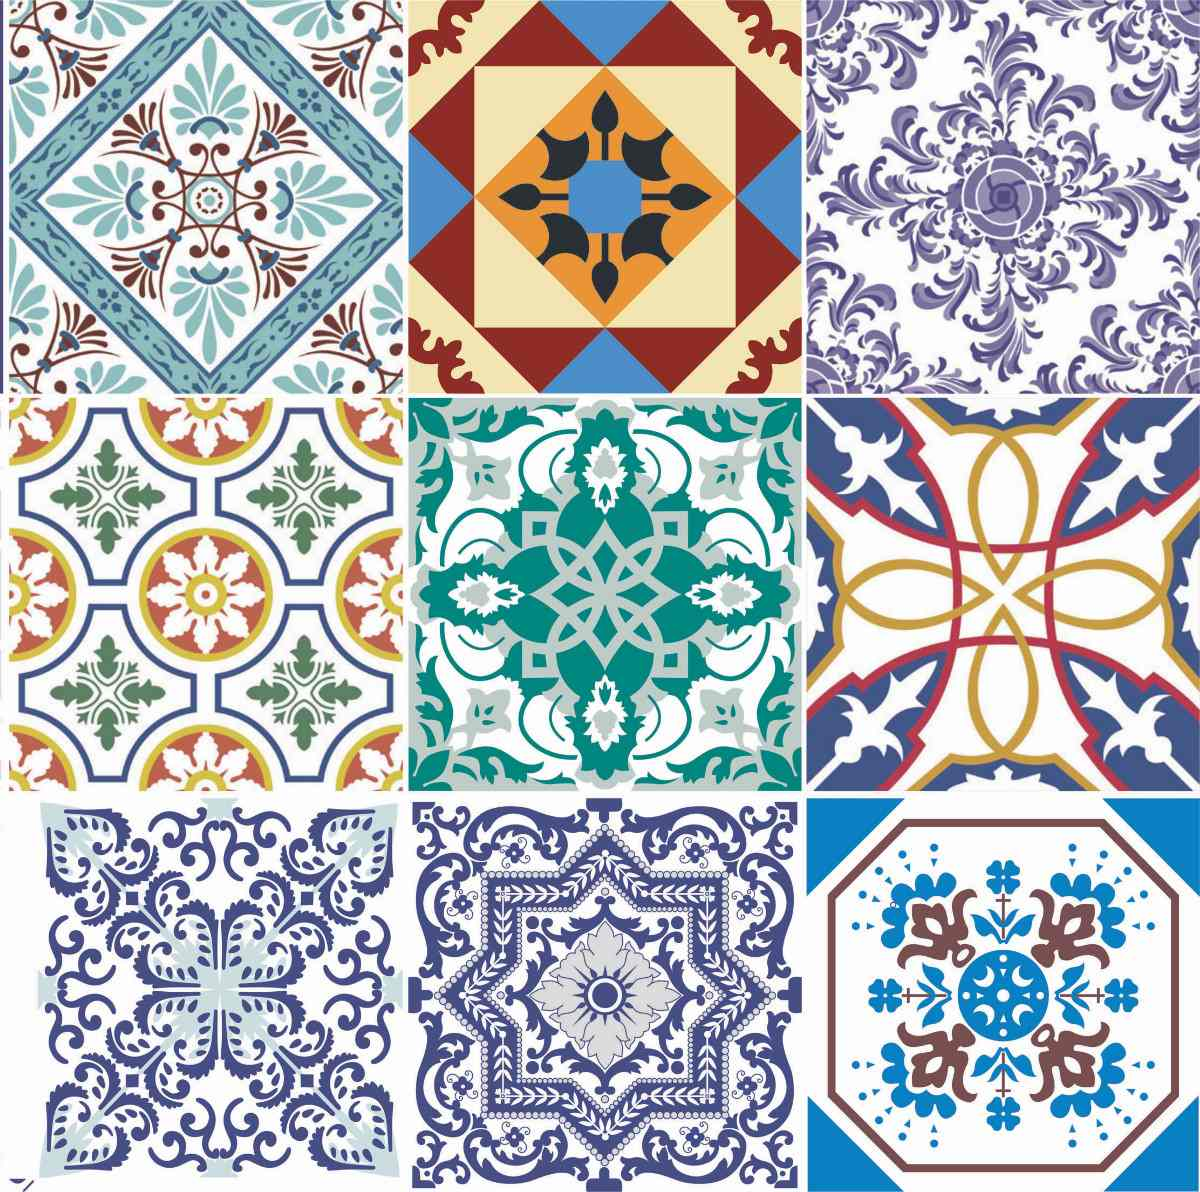 Adesivo pastilha azulejo ladrilho 20 unidades 15x15 r for Azulejo 15x15